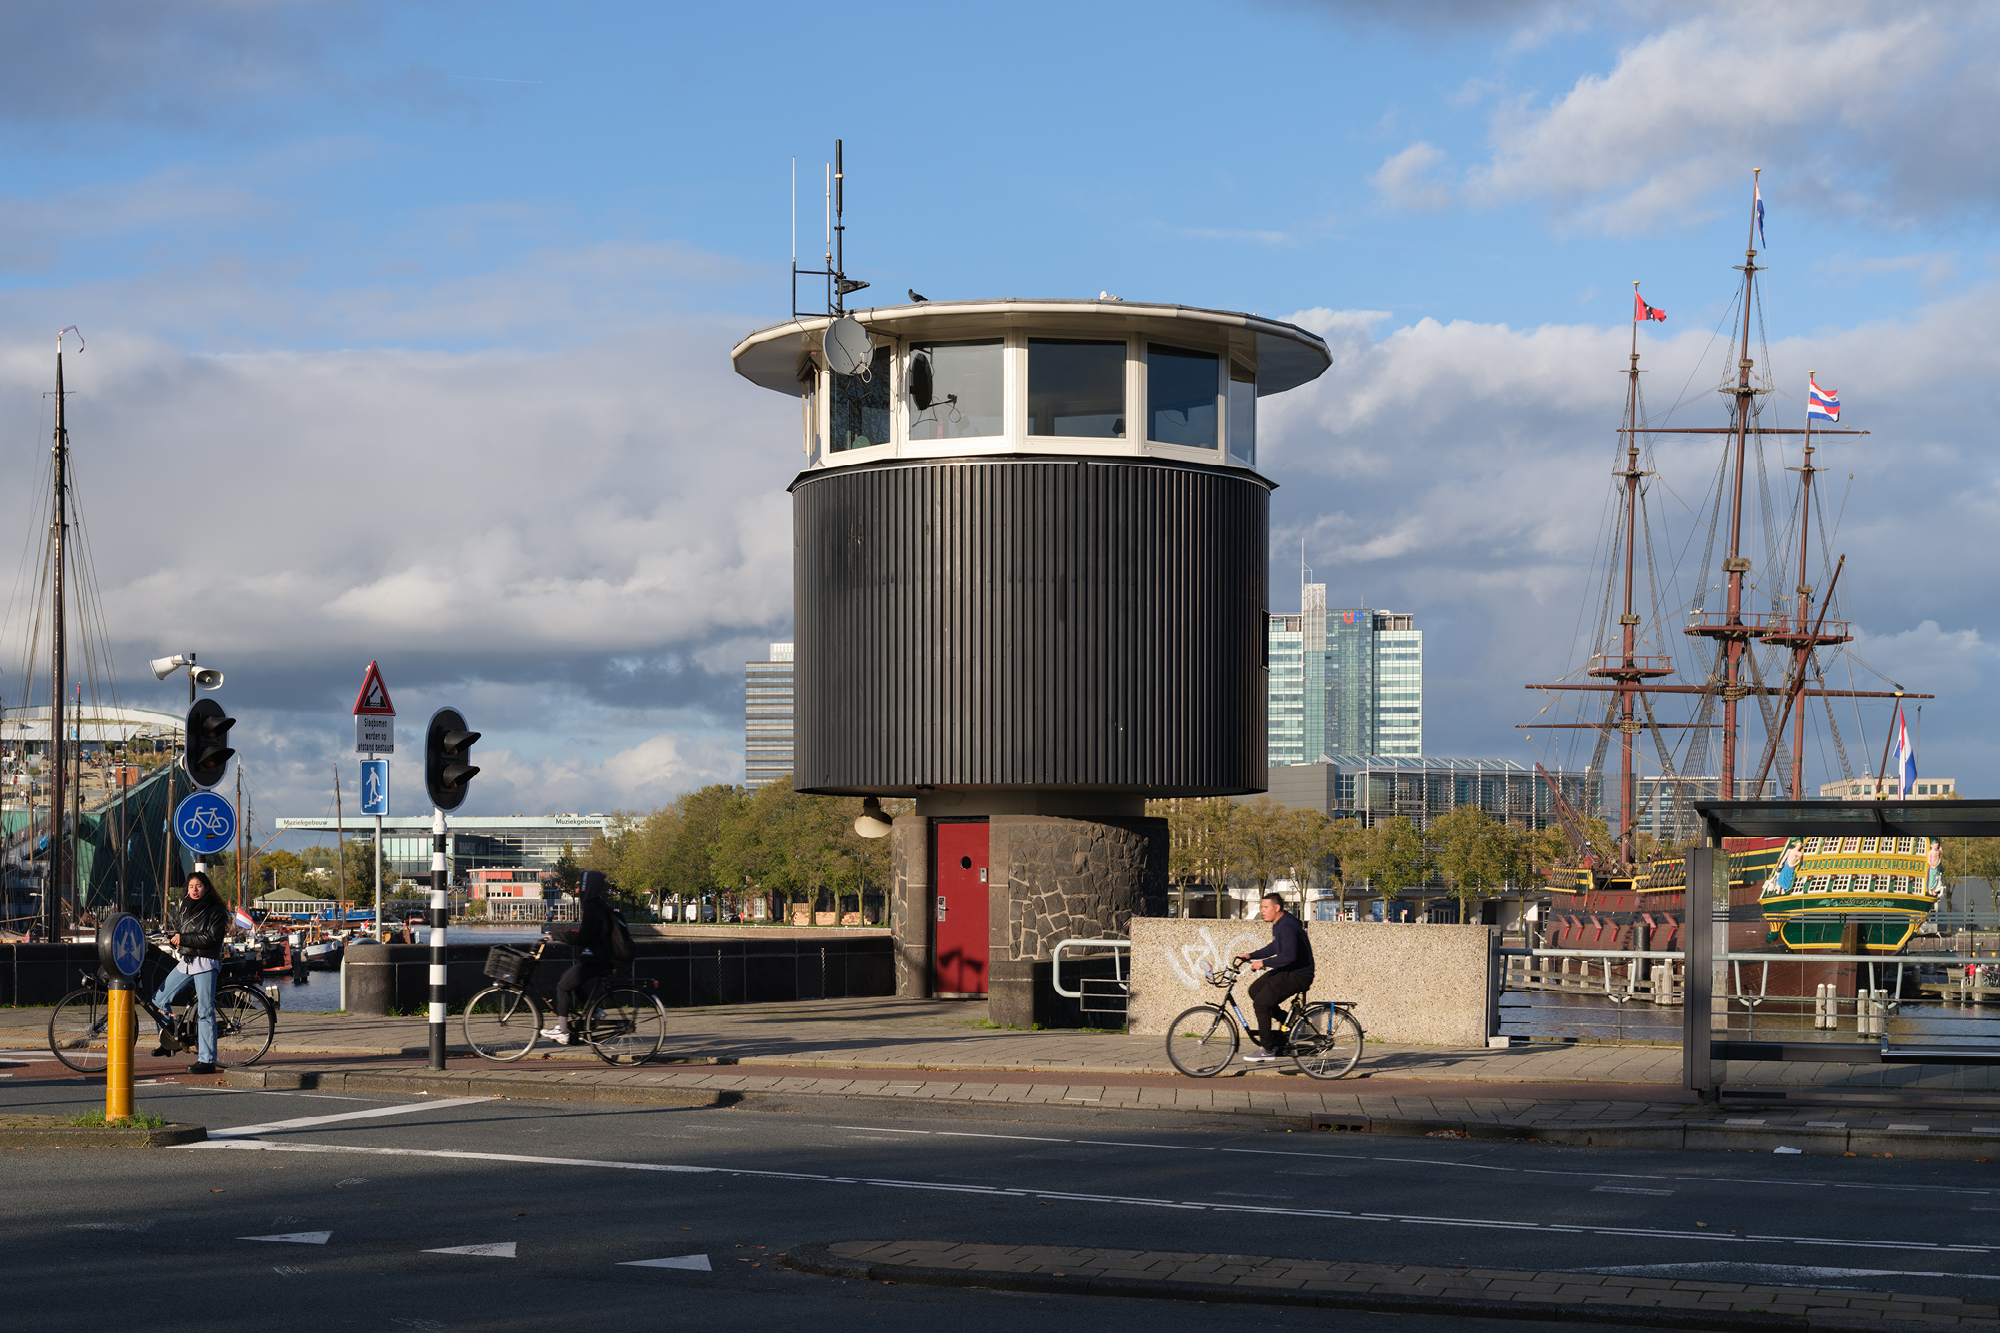 SWEETS hotel Amsterdam_bridge house Kortjewantsbrug_exterior_prins hendrikkade_photography Ossip Duivenbode